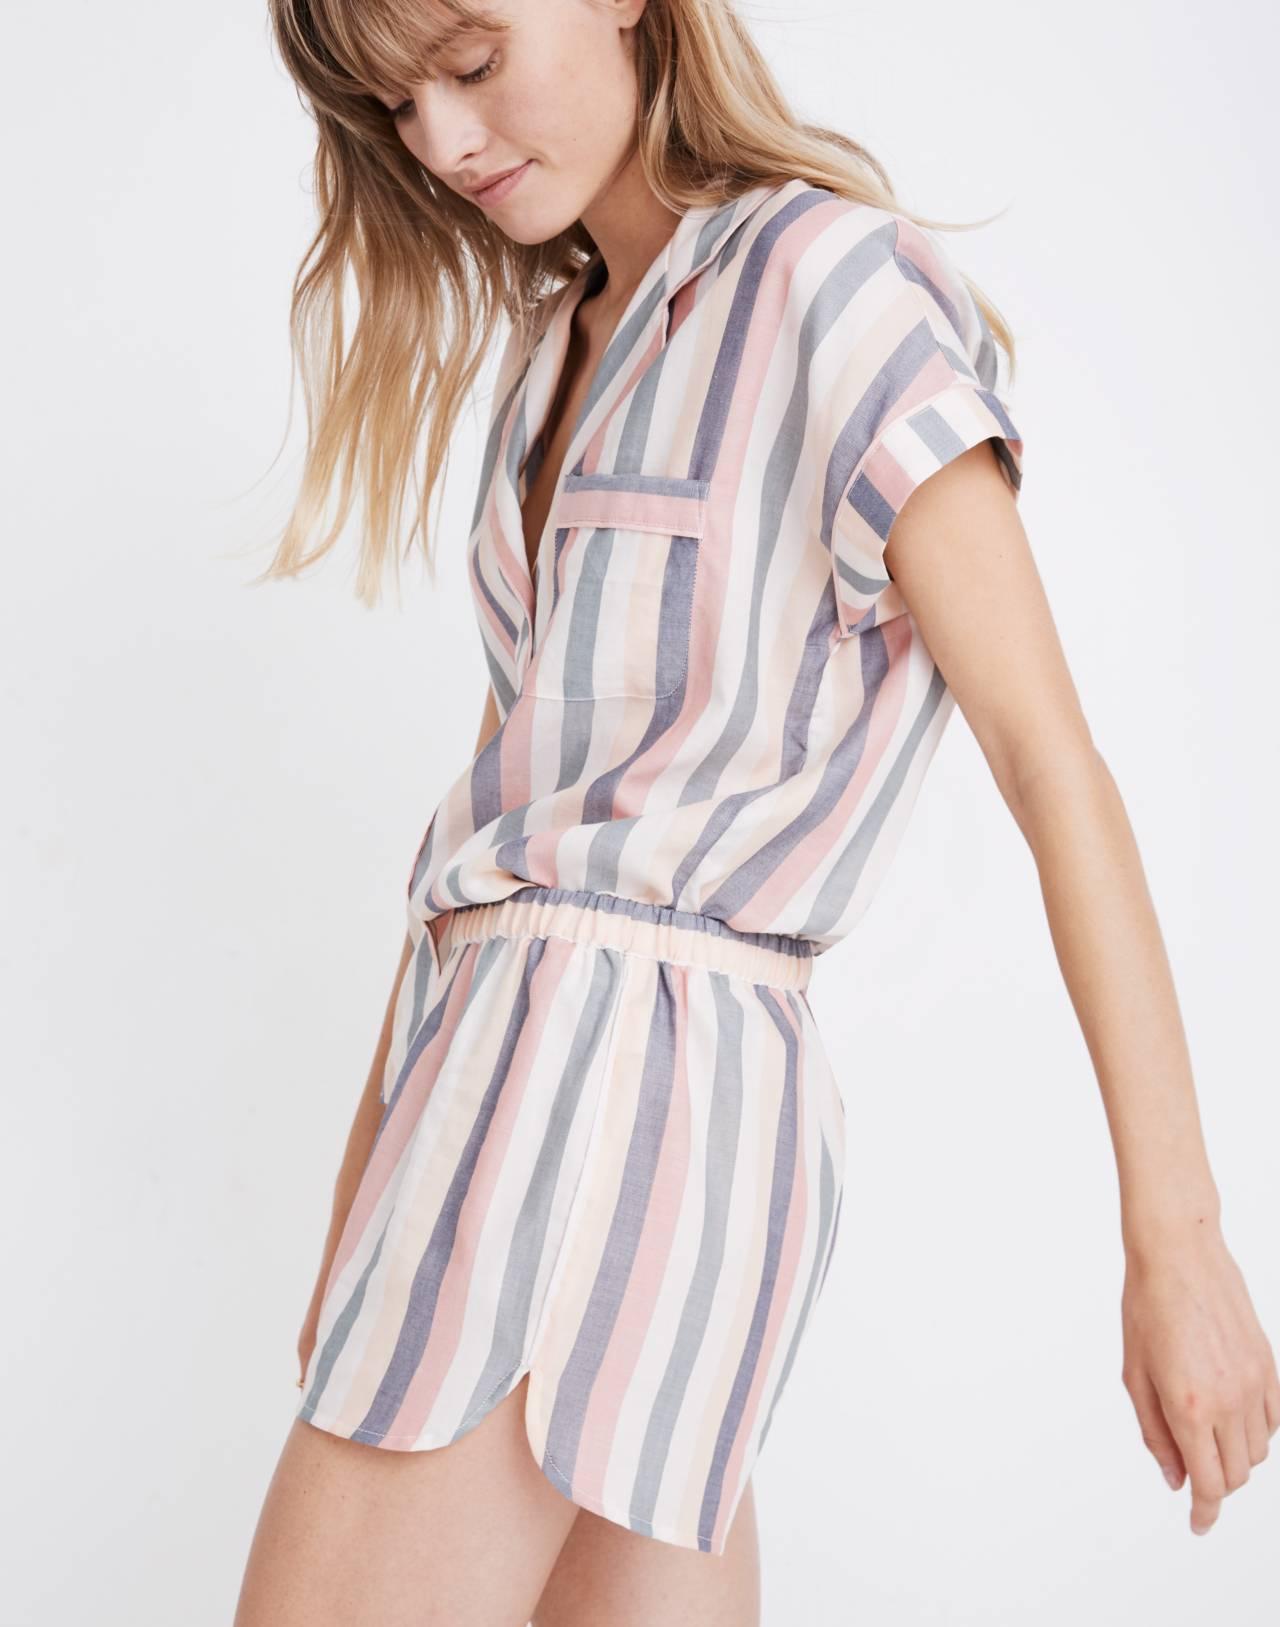 Flannel Bedtime Pajama Top in Lonnie Stripe in sweet dahlia jessie stripe image 1